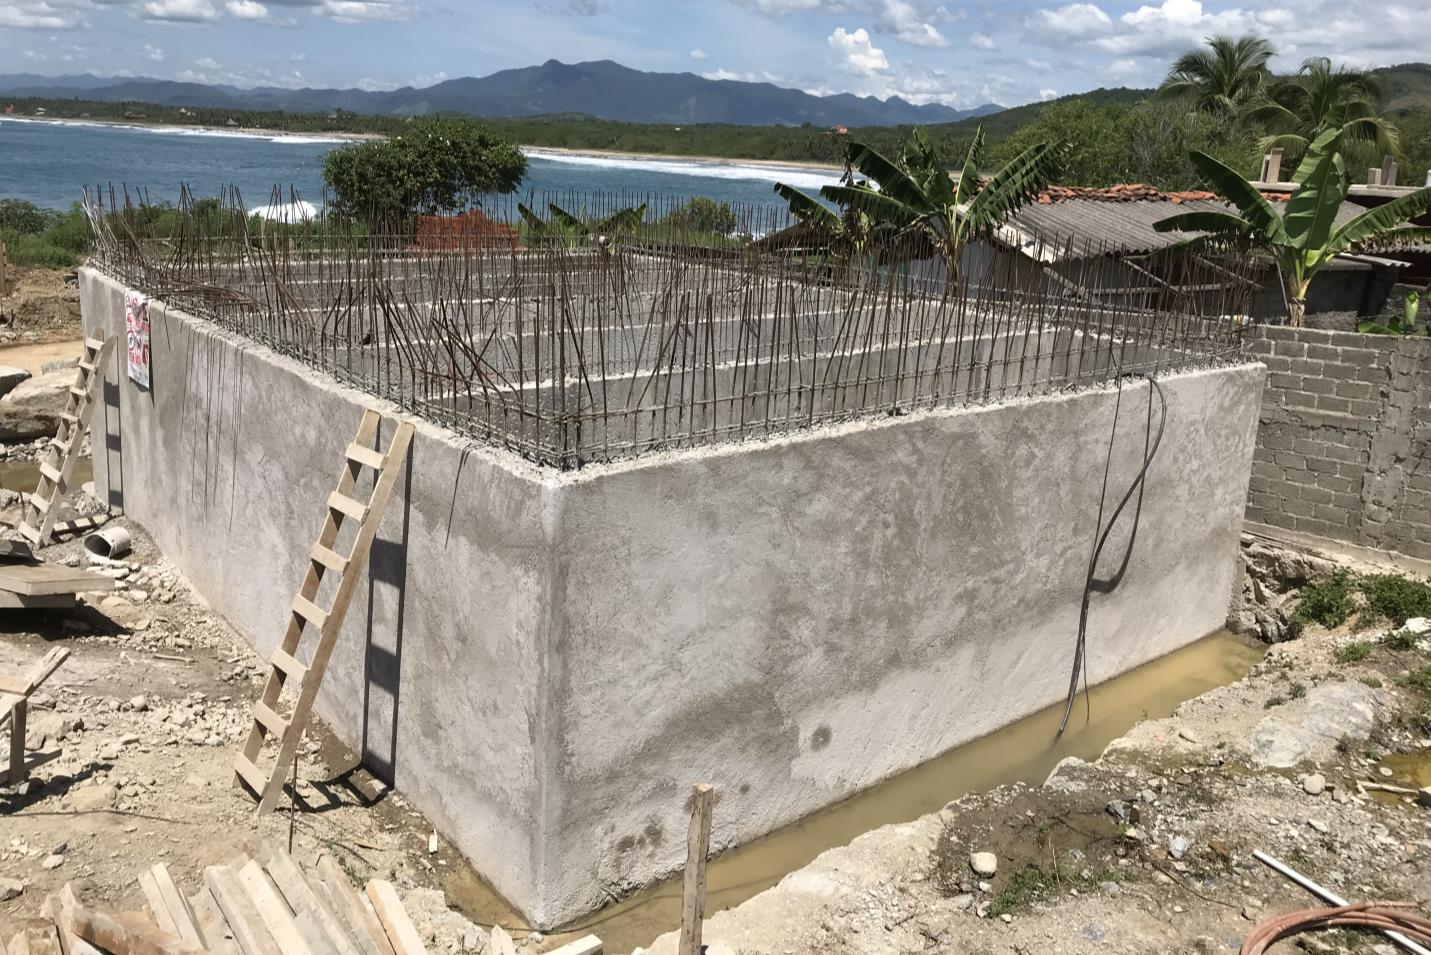 REPORTE-FOTOGRAFICO-PUNTA-MAJAHUA-29-SEPTIEMBRE-DEL-2018-043.jpg